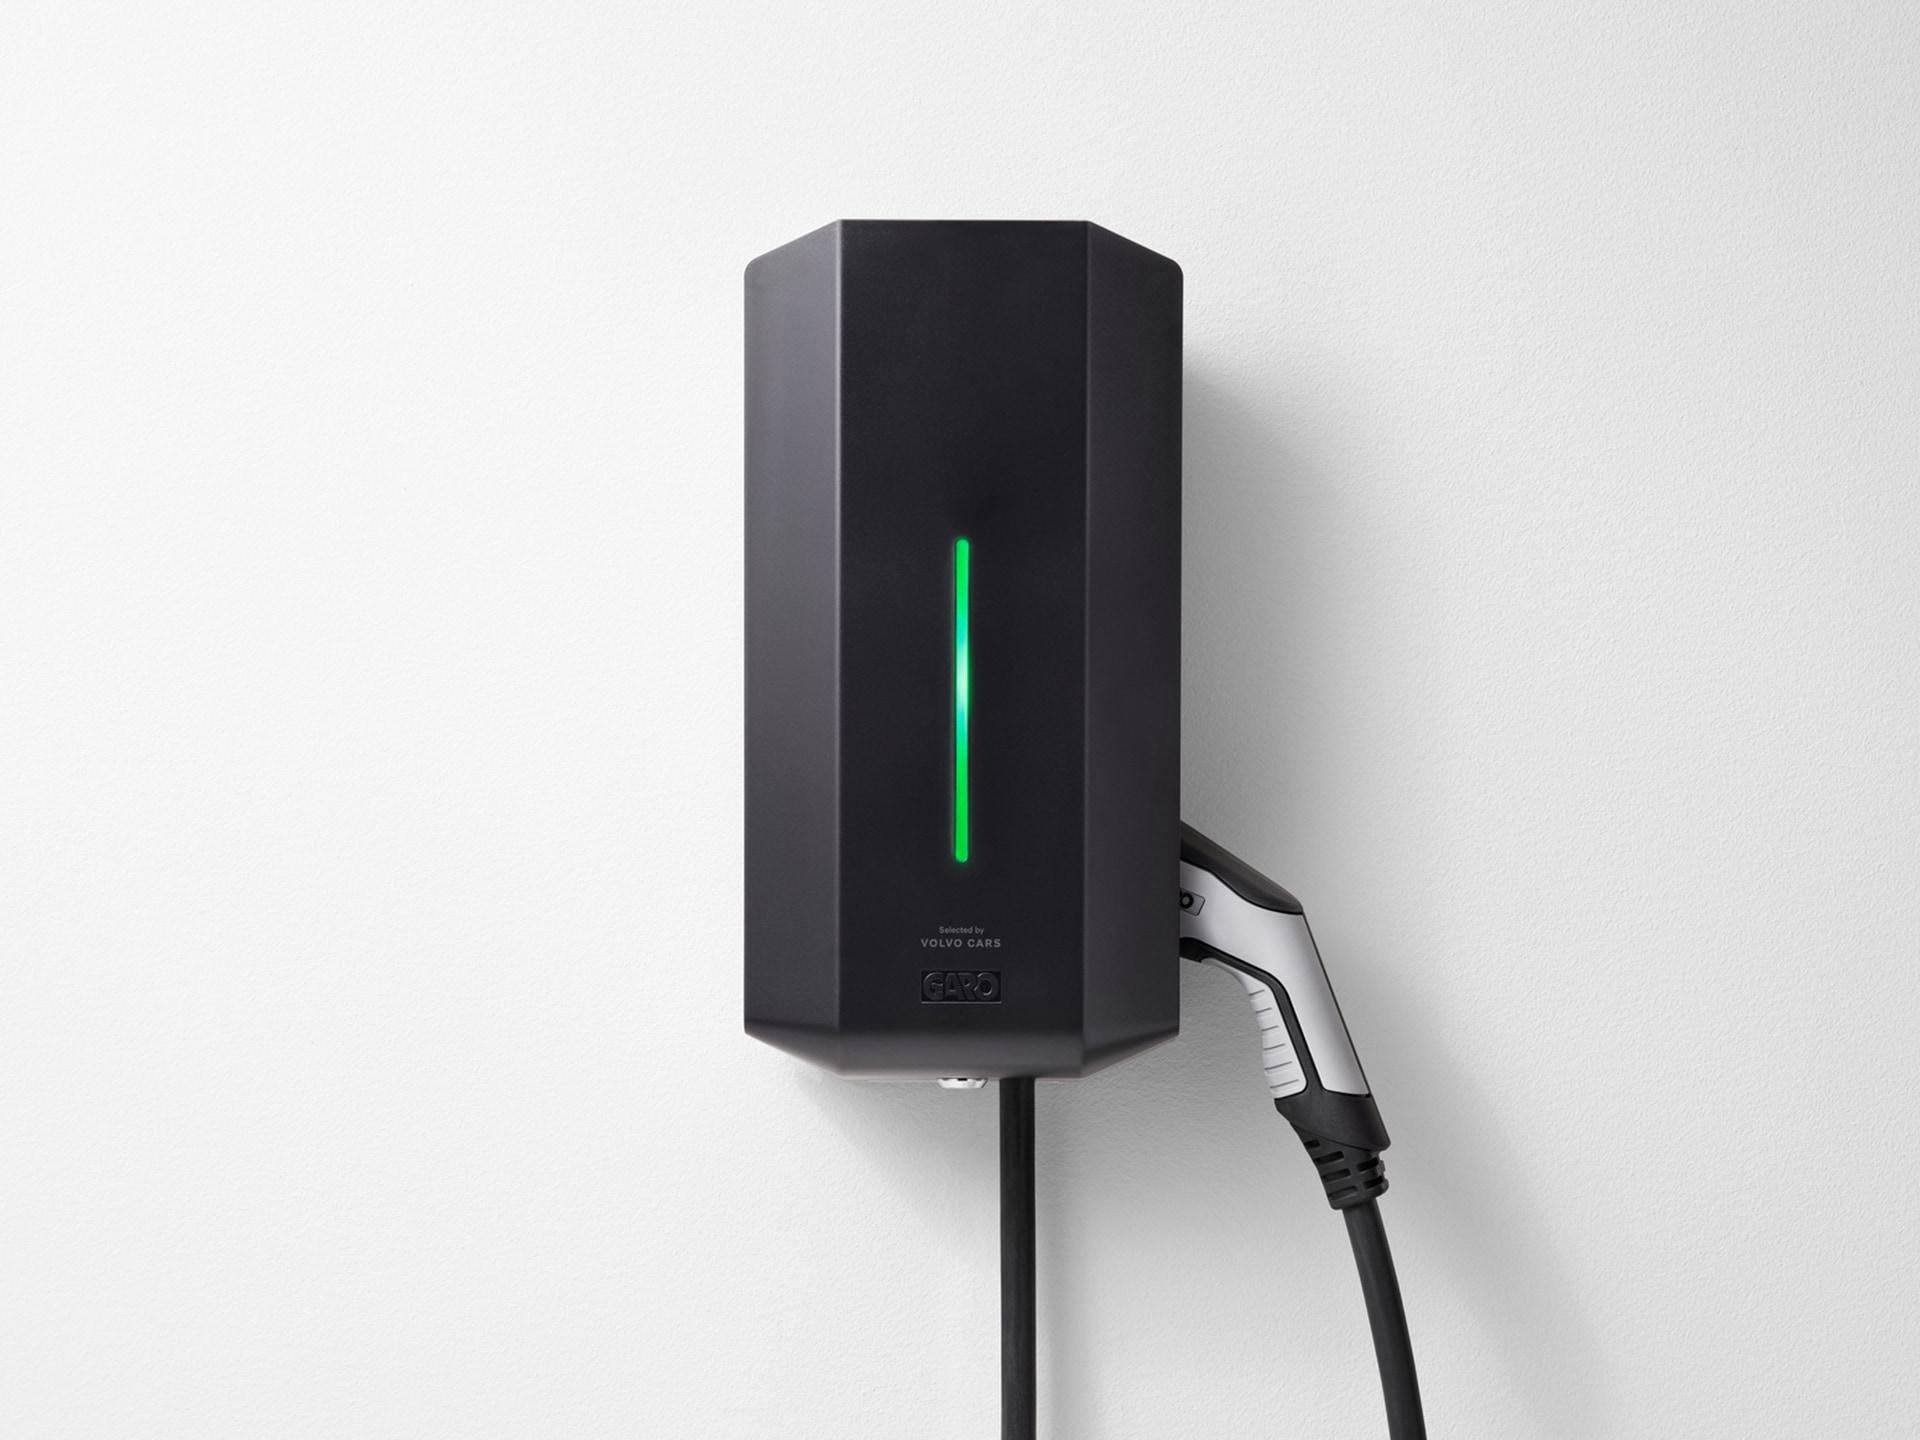 Image of Wallbox